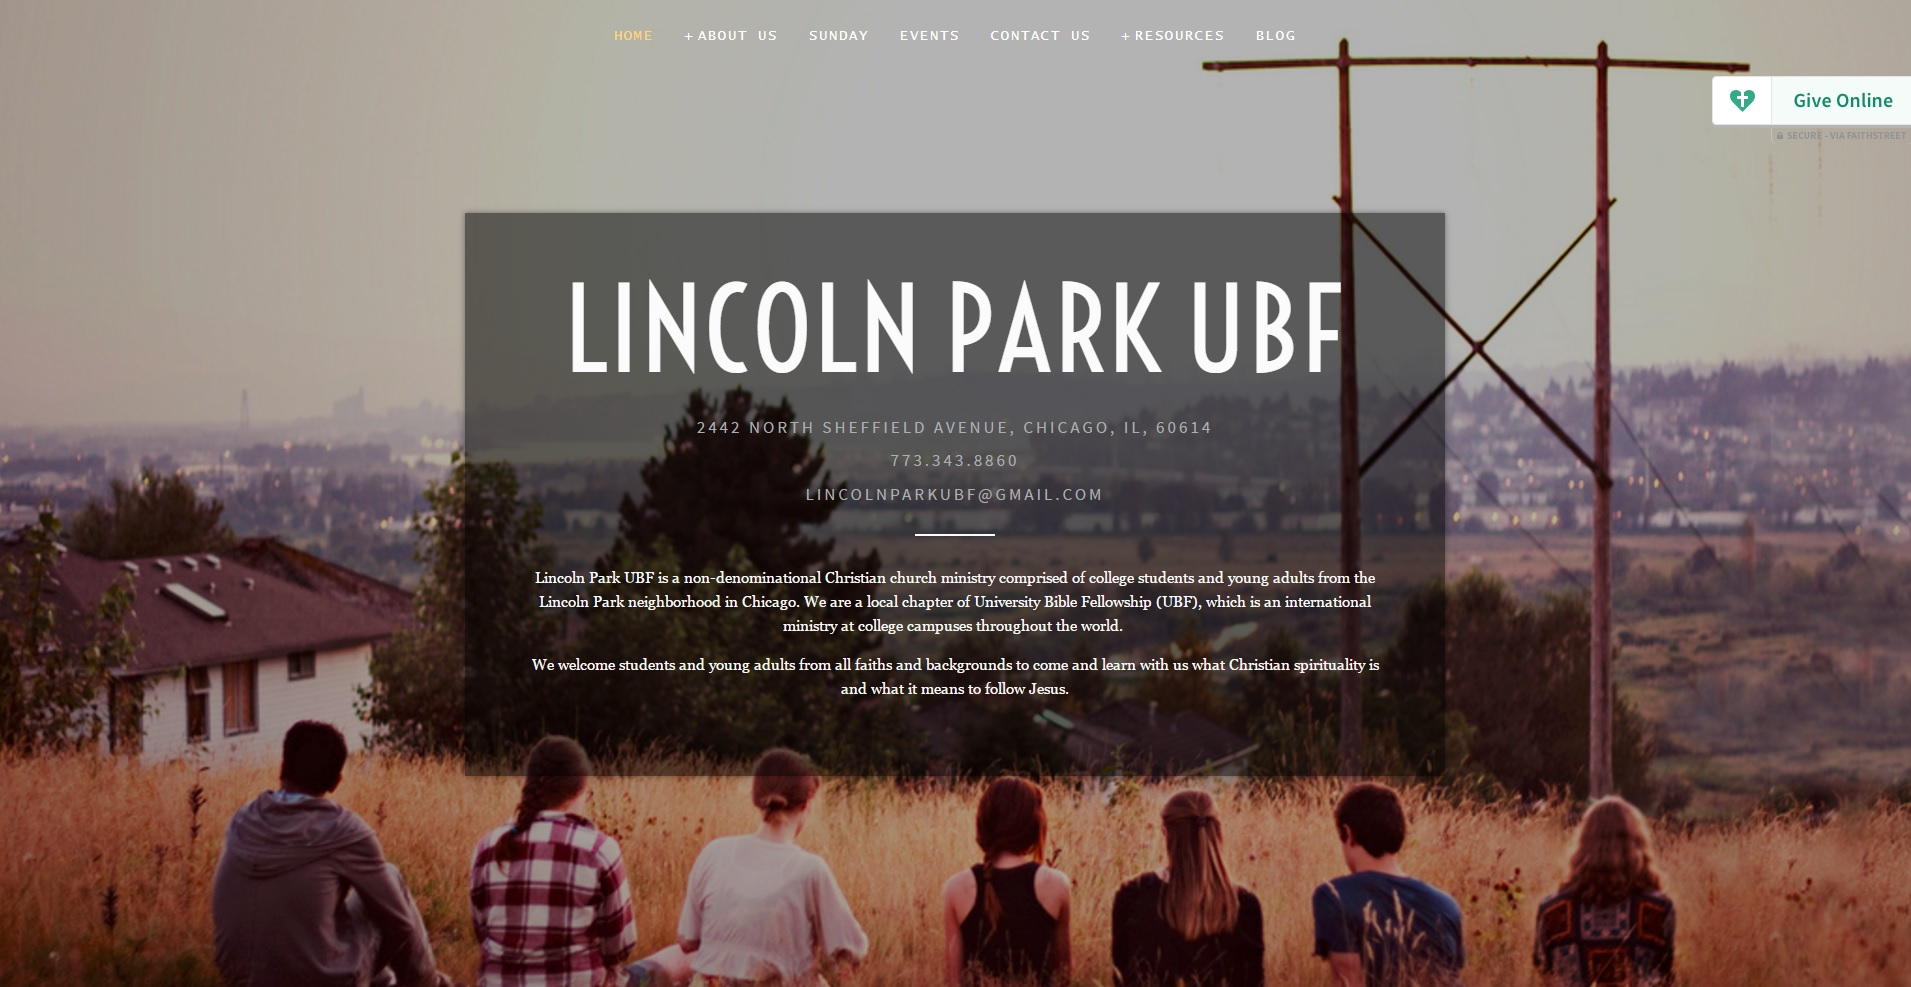 Lincoln Park UBF